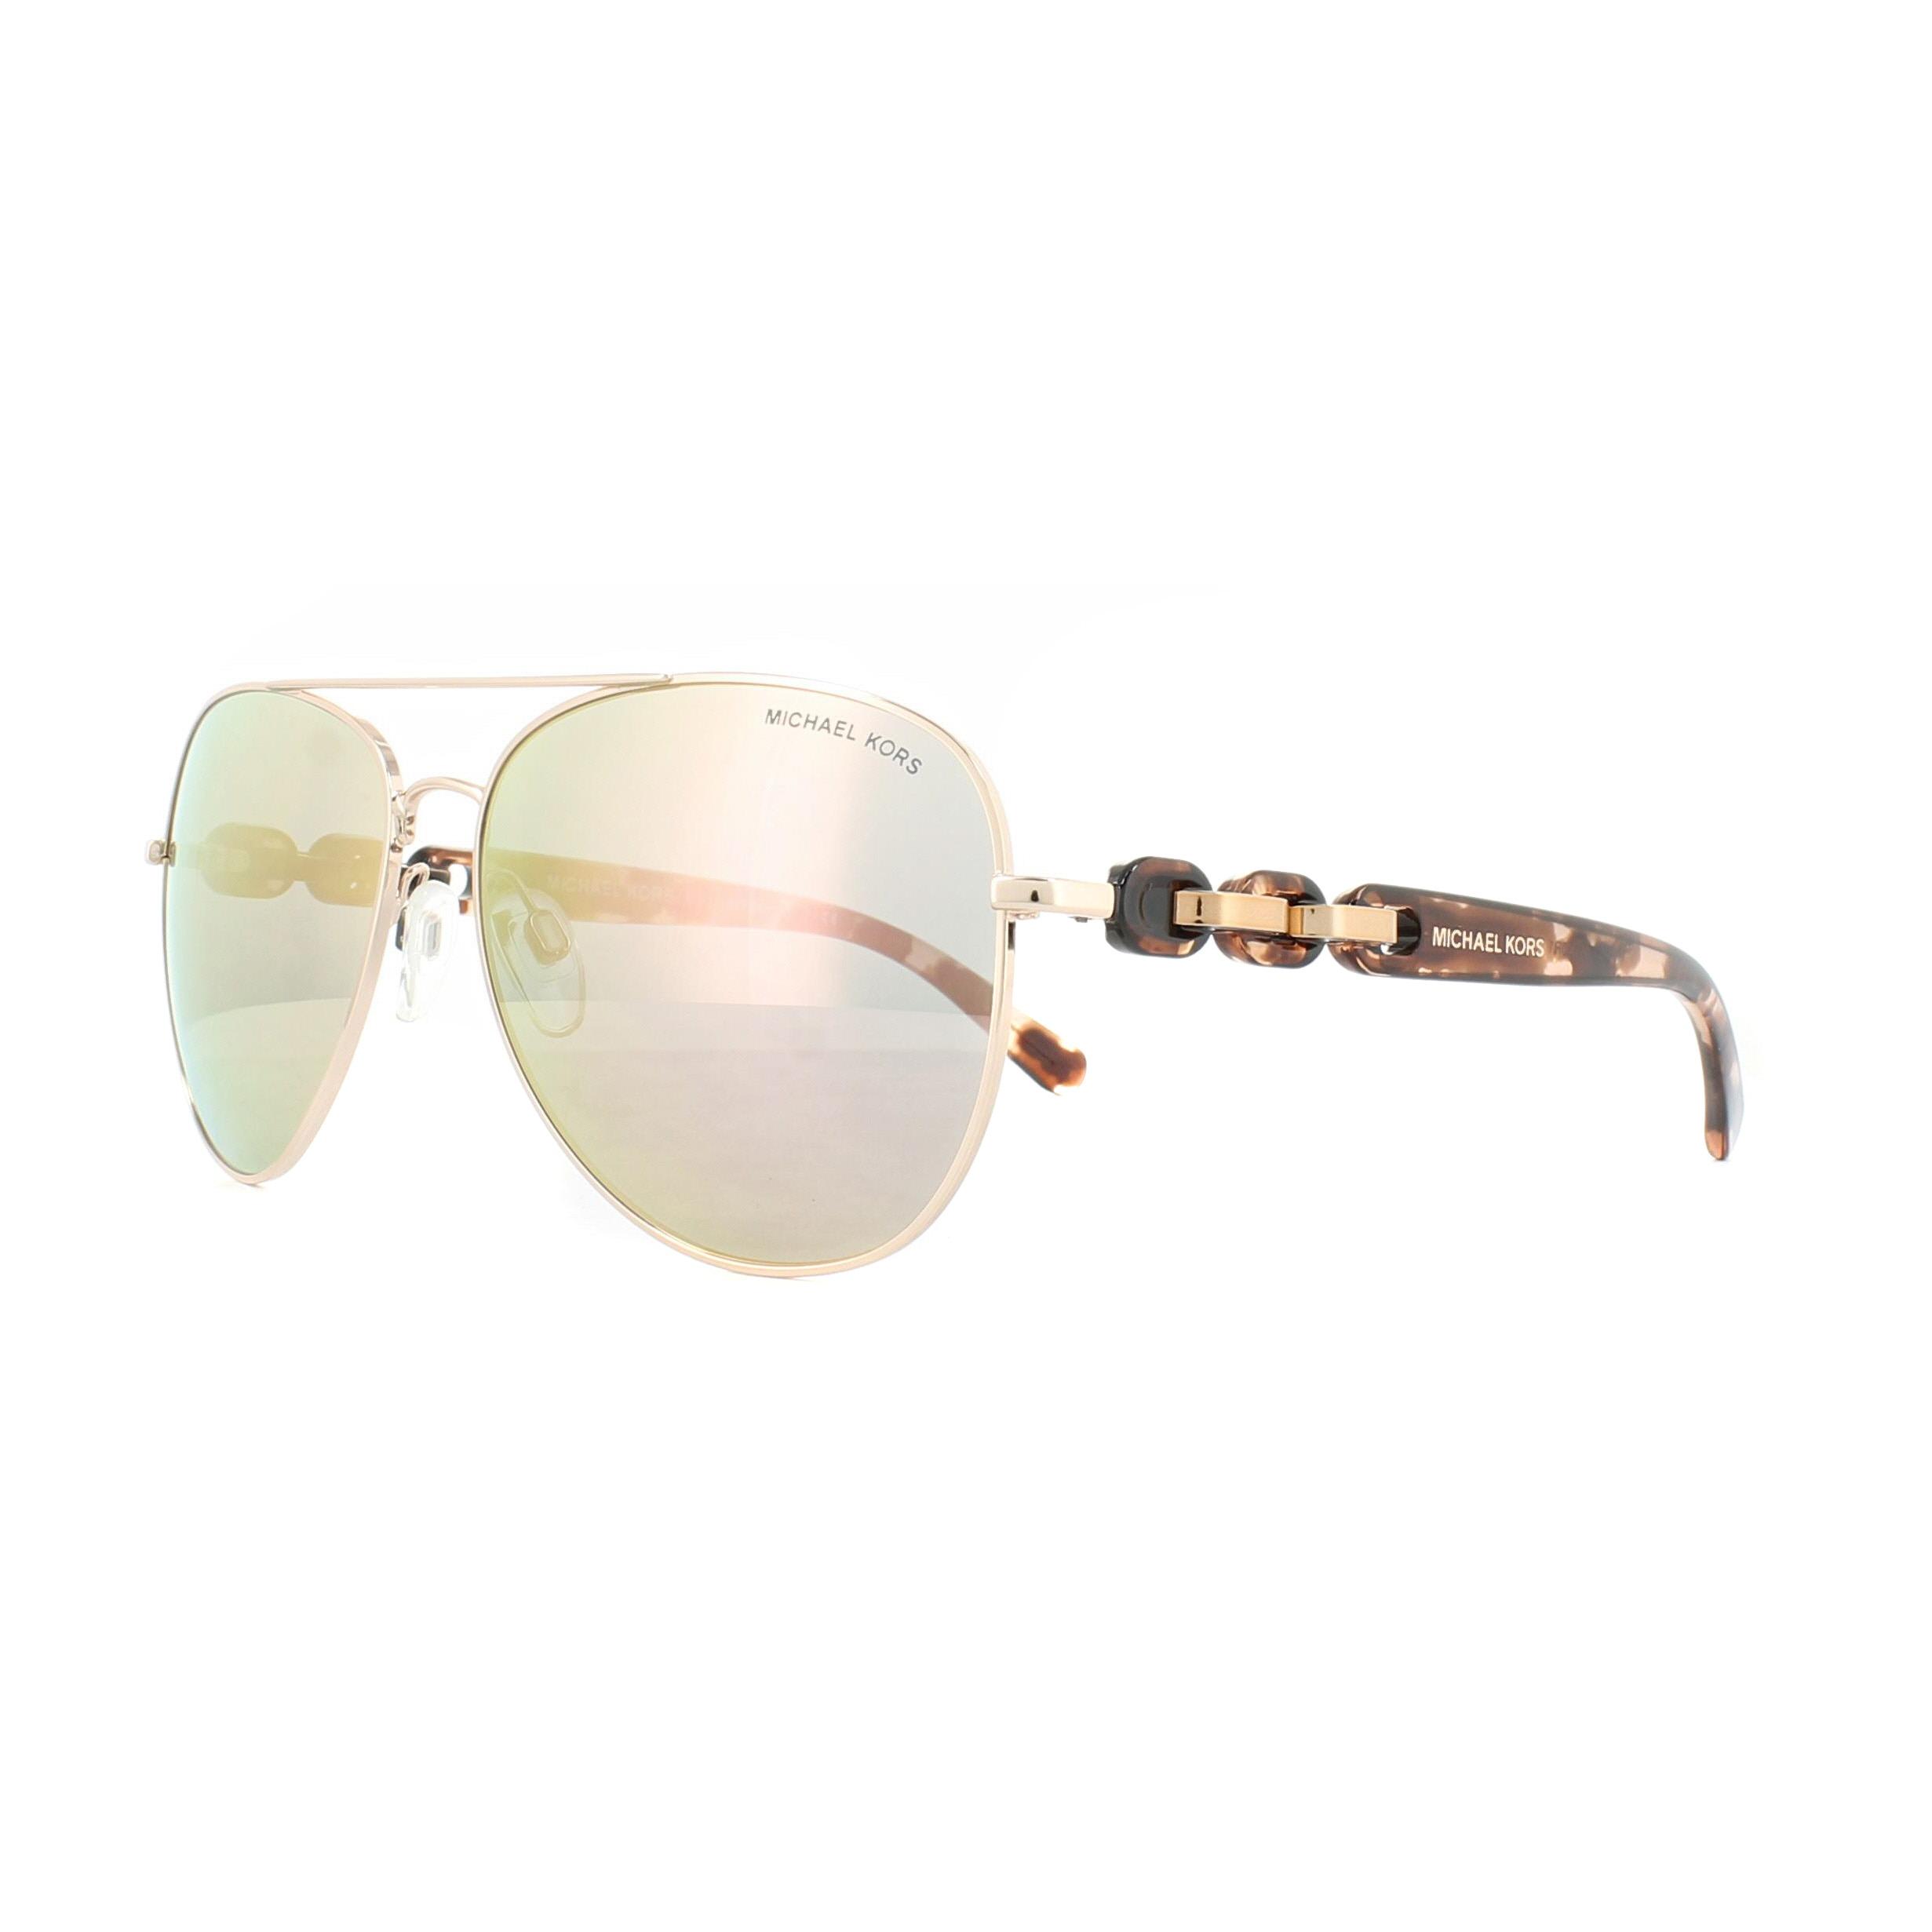 Sentinel Michael Kors Sunglasses Pandora 1015 1130R1 Rose Gold Rose Gold  Mirror b4b1c79cbc